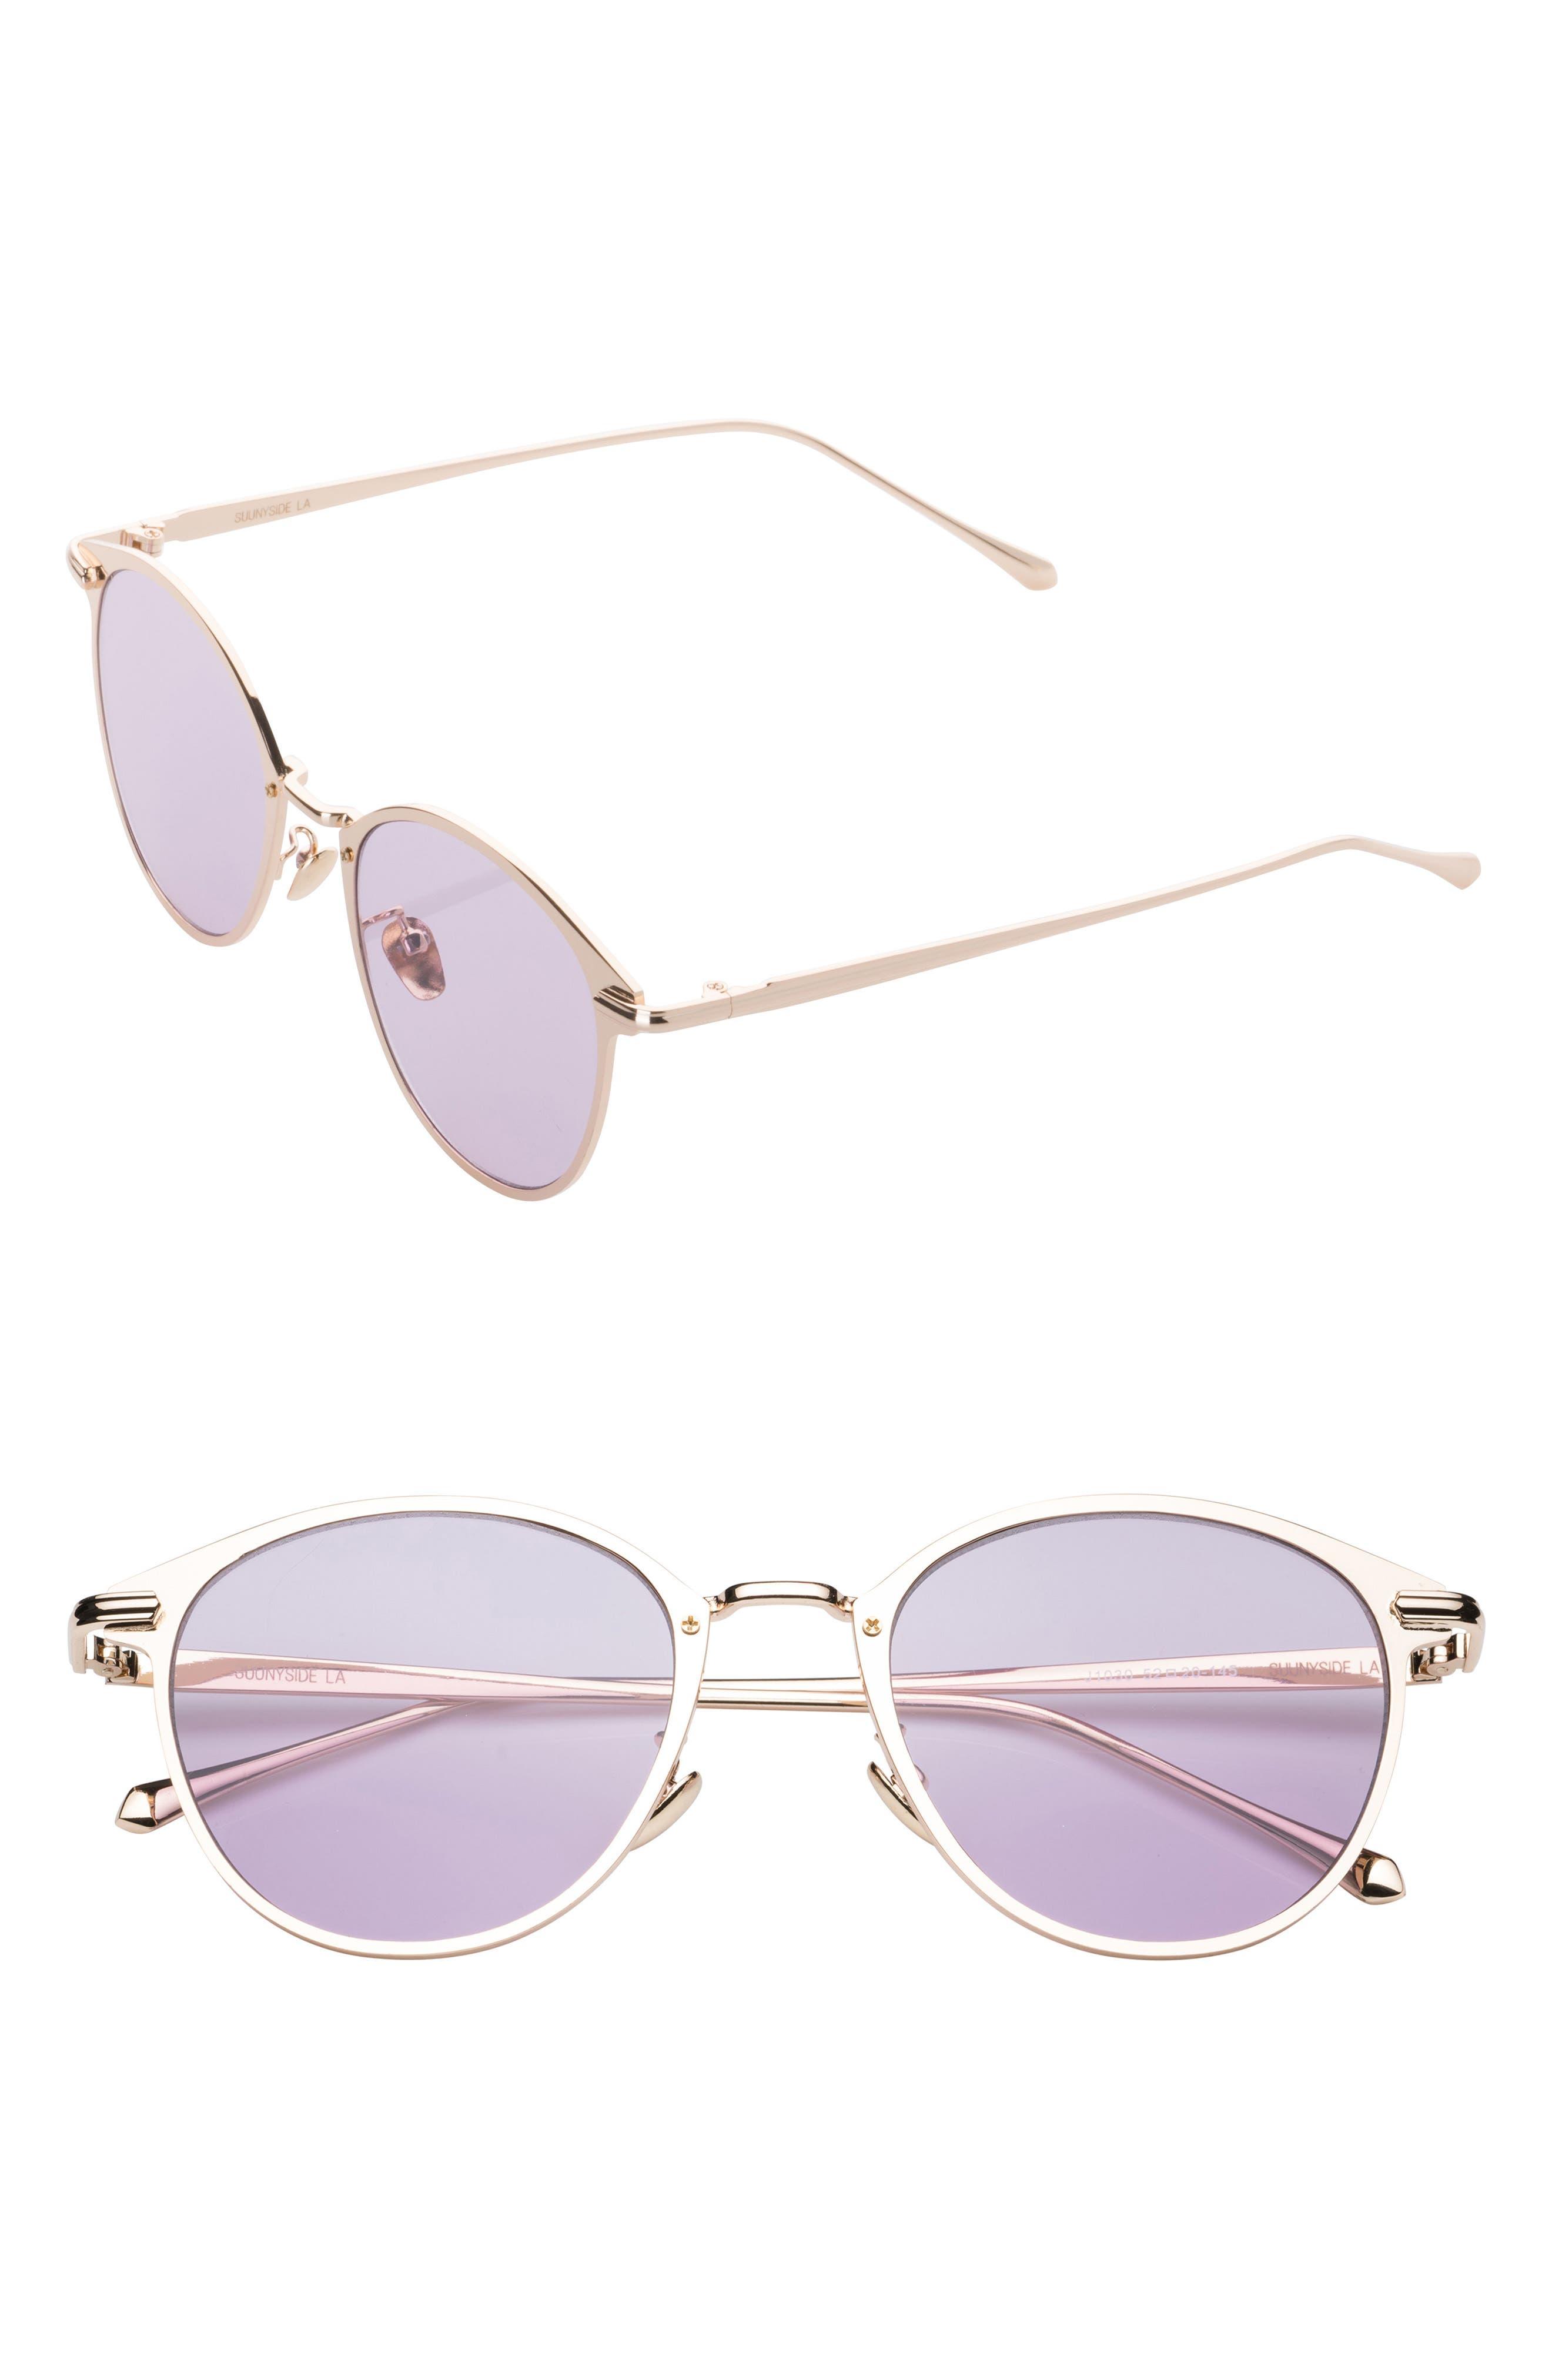 51mm Oxford Sunglasses,                             Main thumbnail 1, color,                             Pink